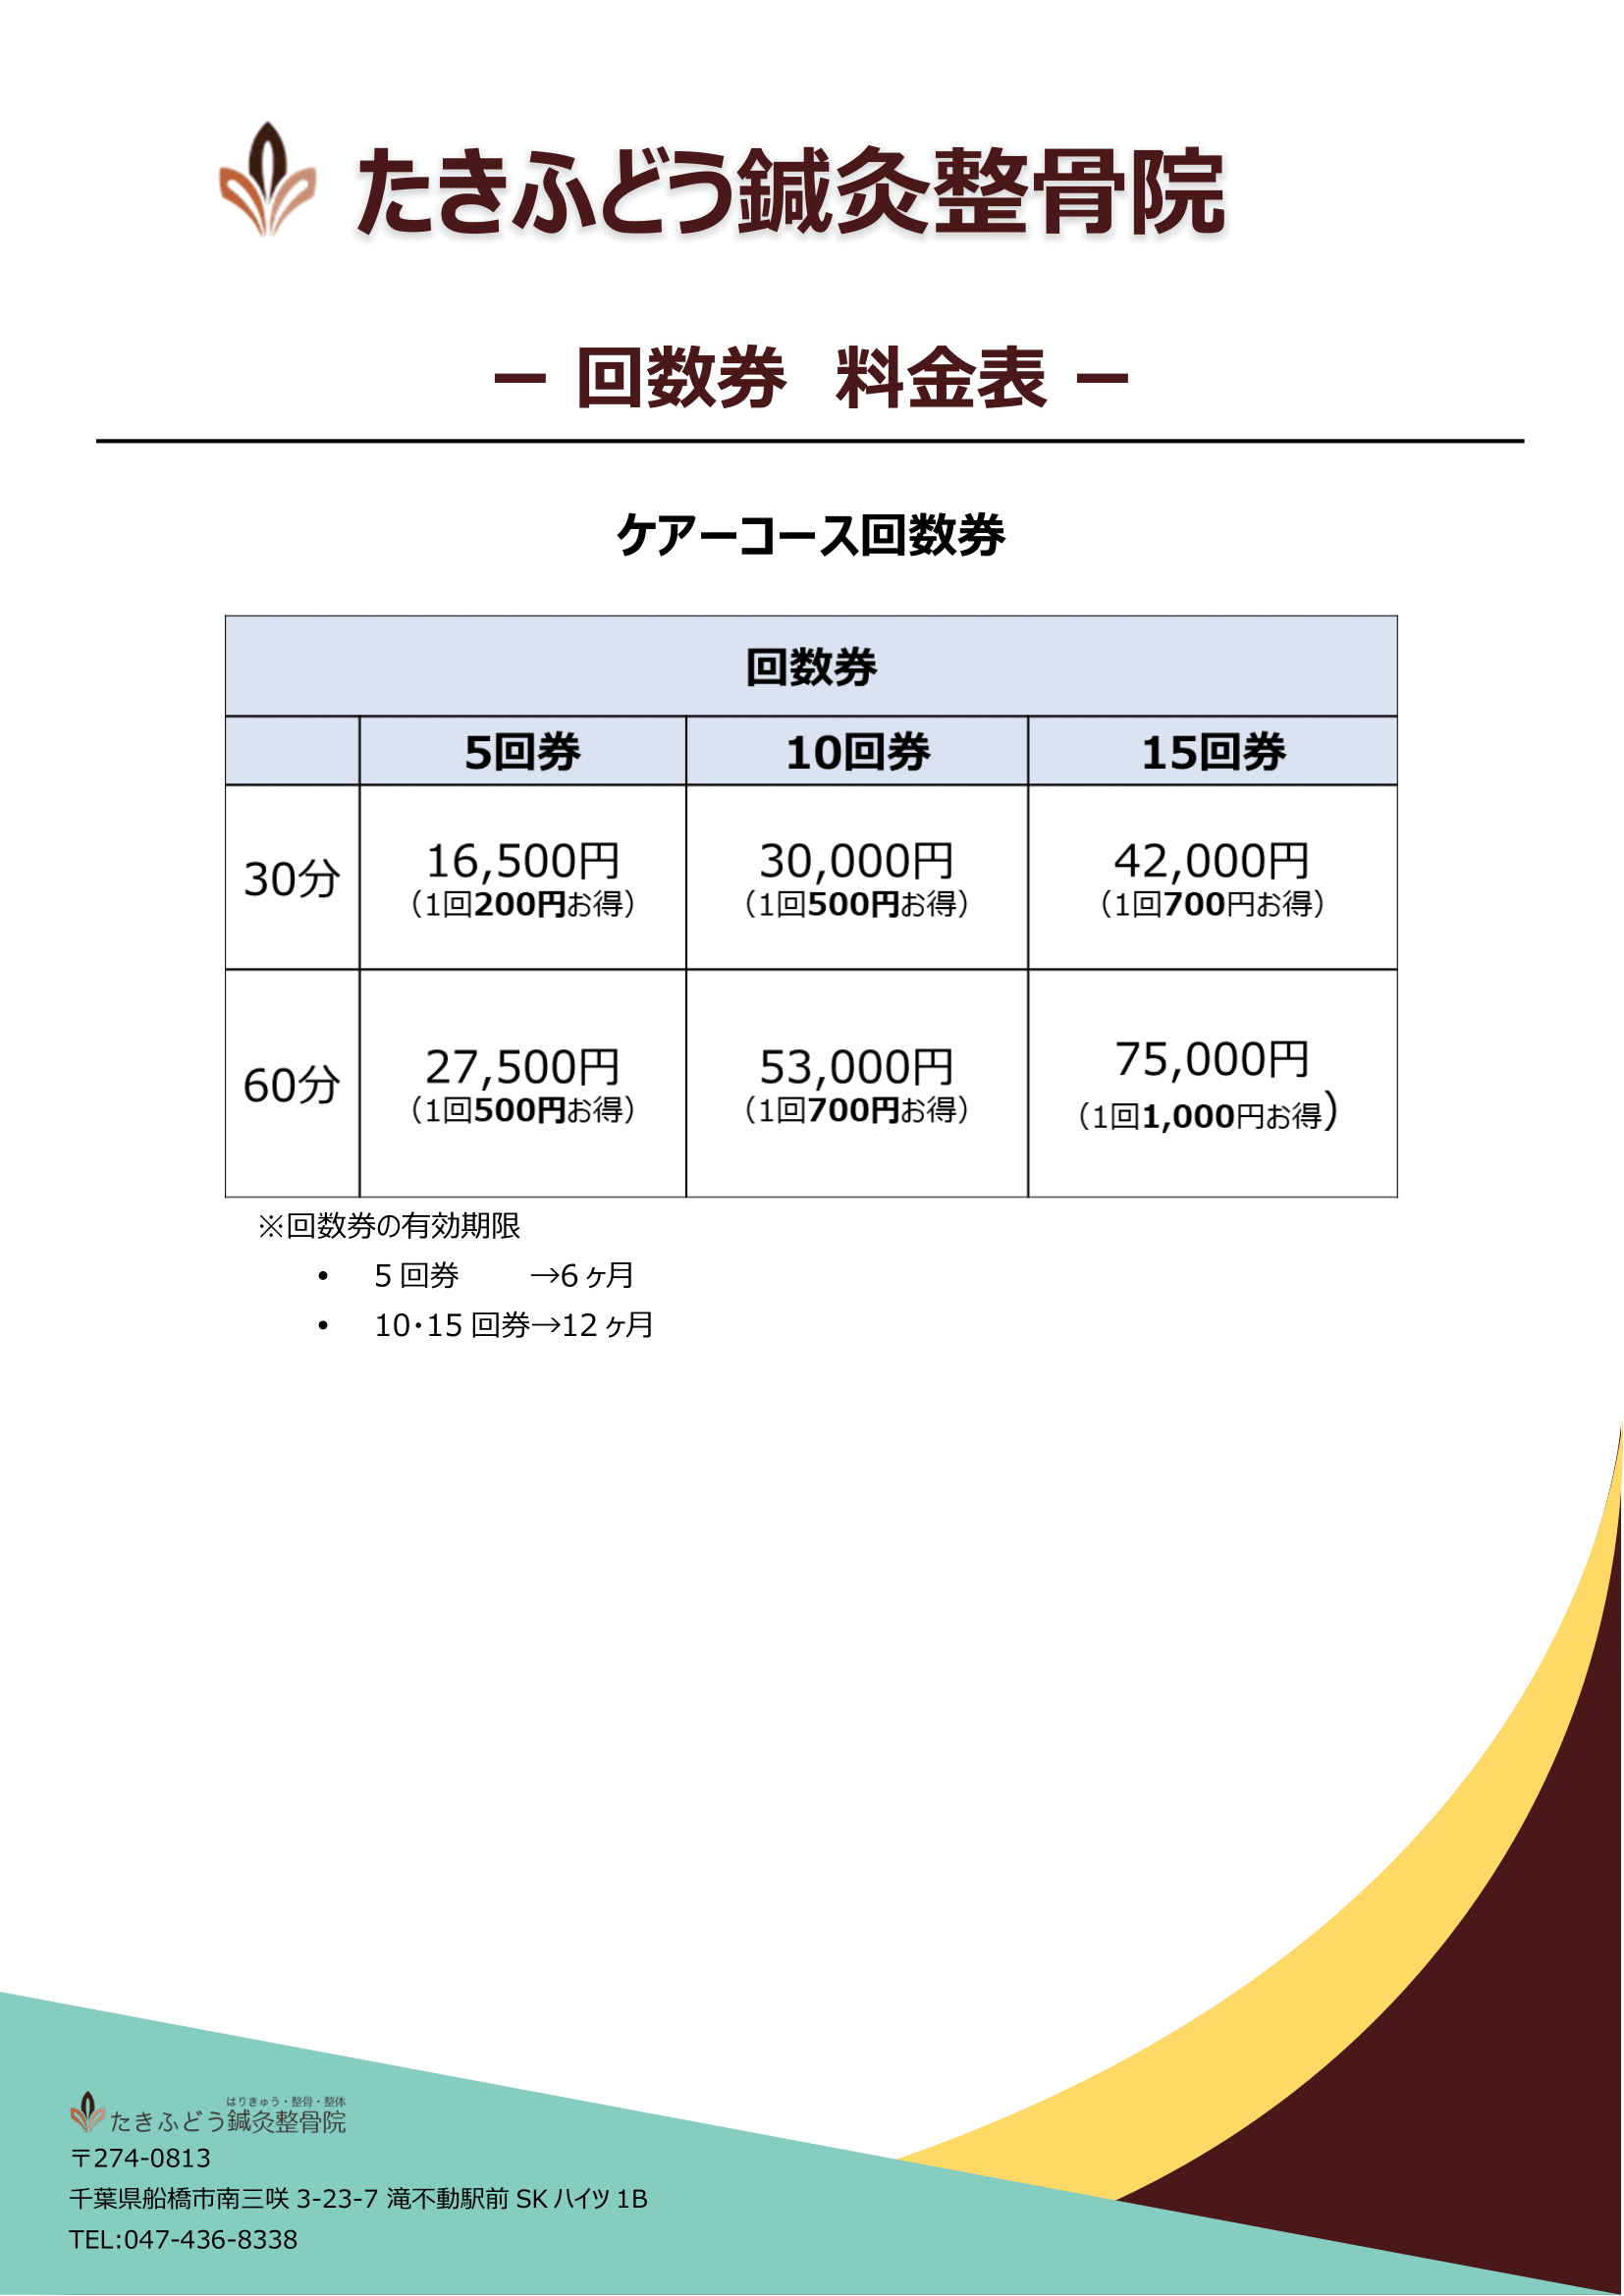 3-medical fees PNG